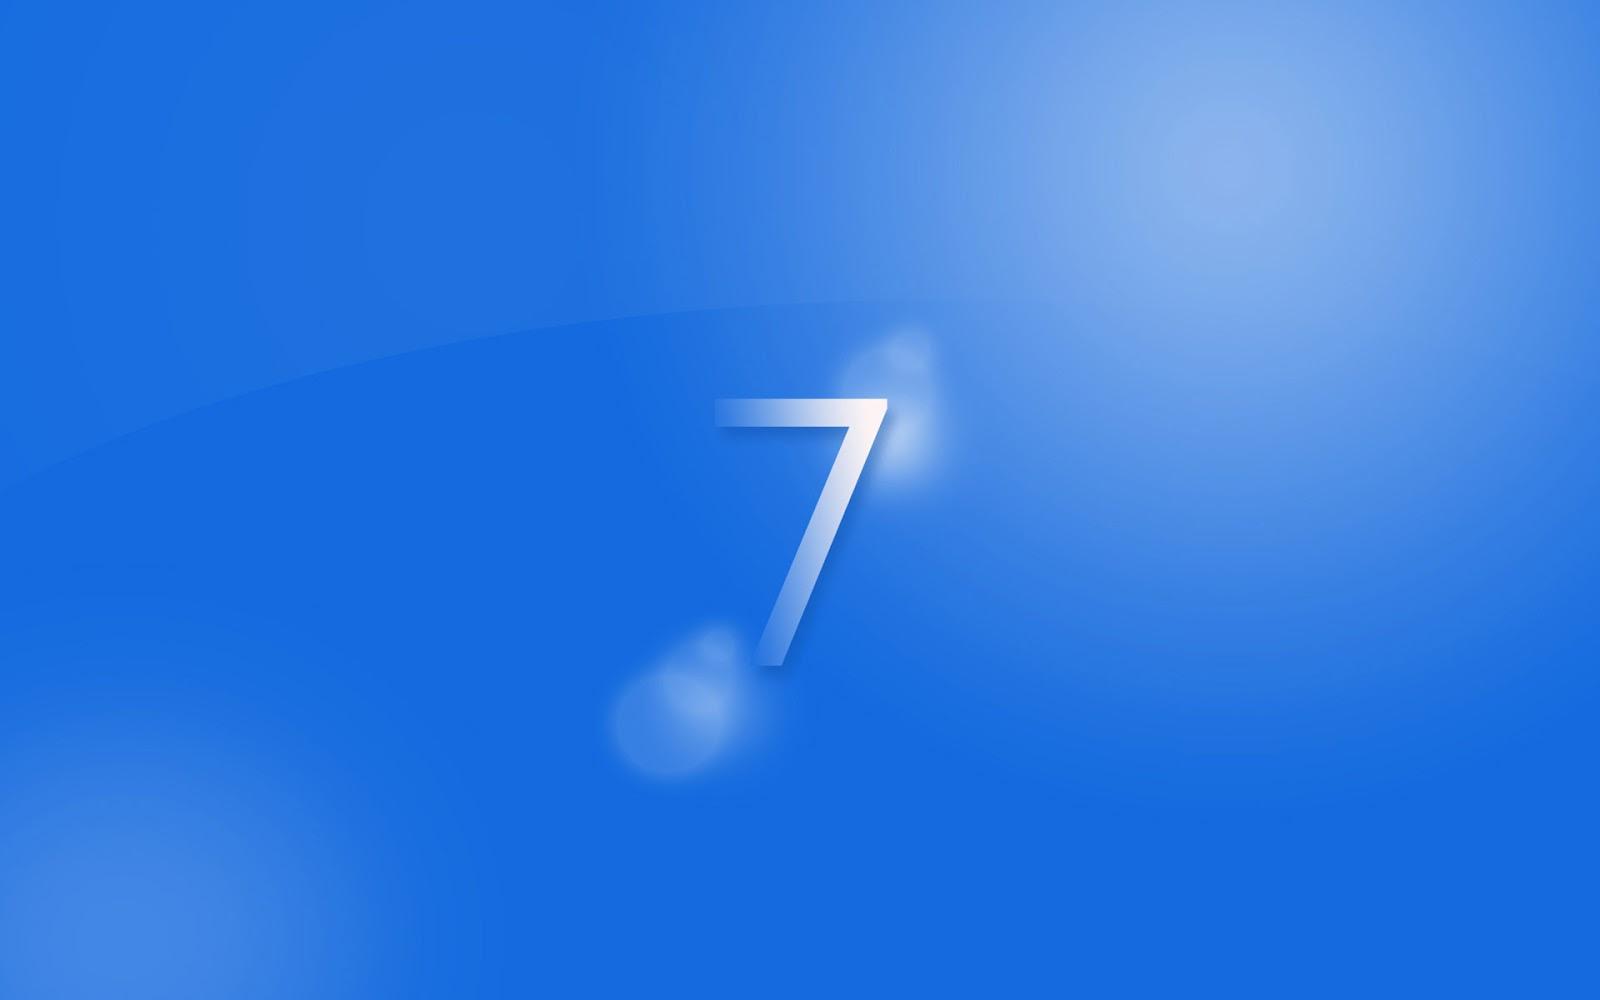 Pubg Hd Wallpaper For Windows 7: Windows 7 Full HD Wallpapers